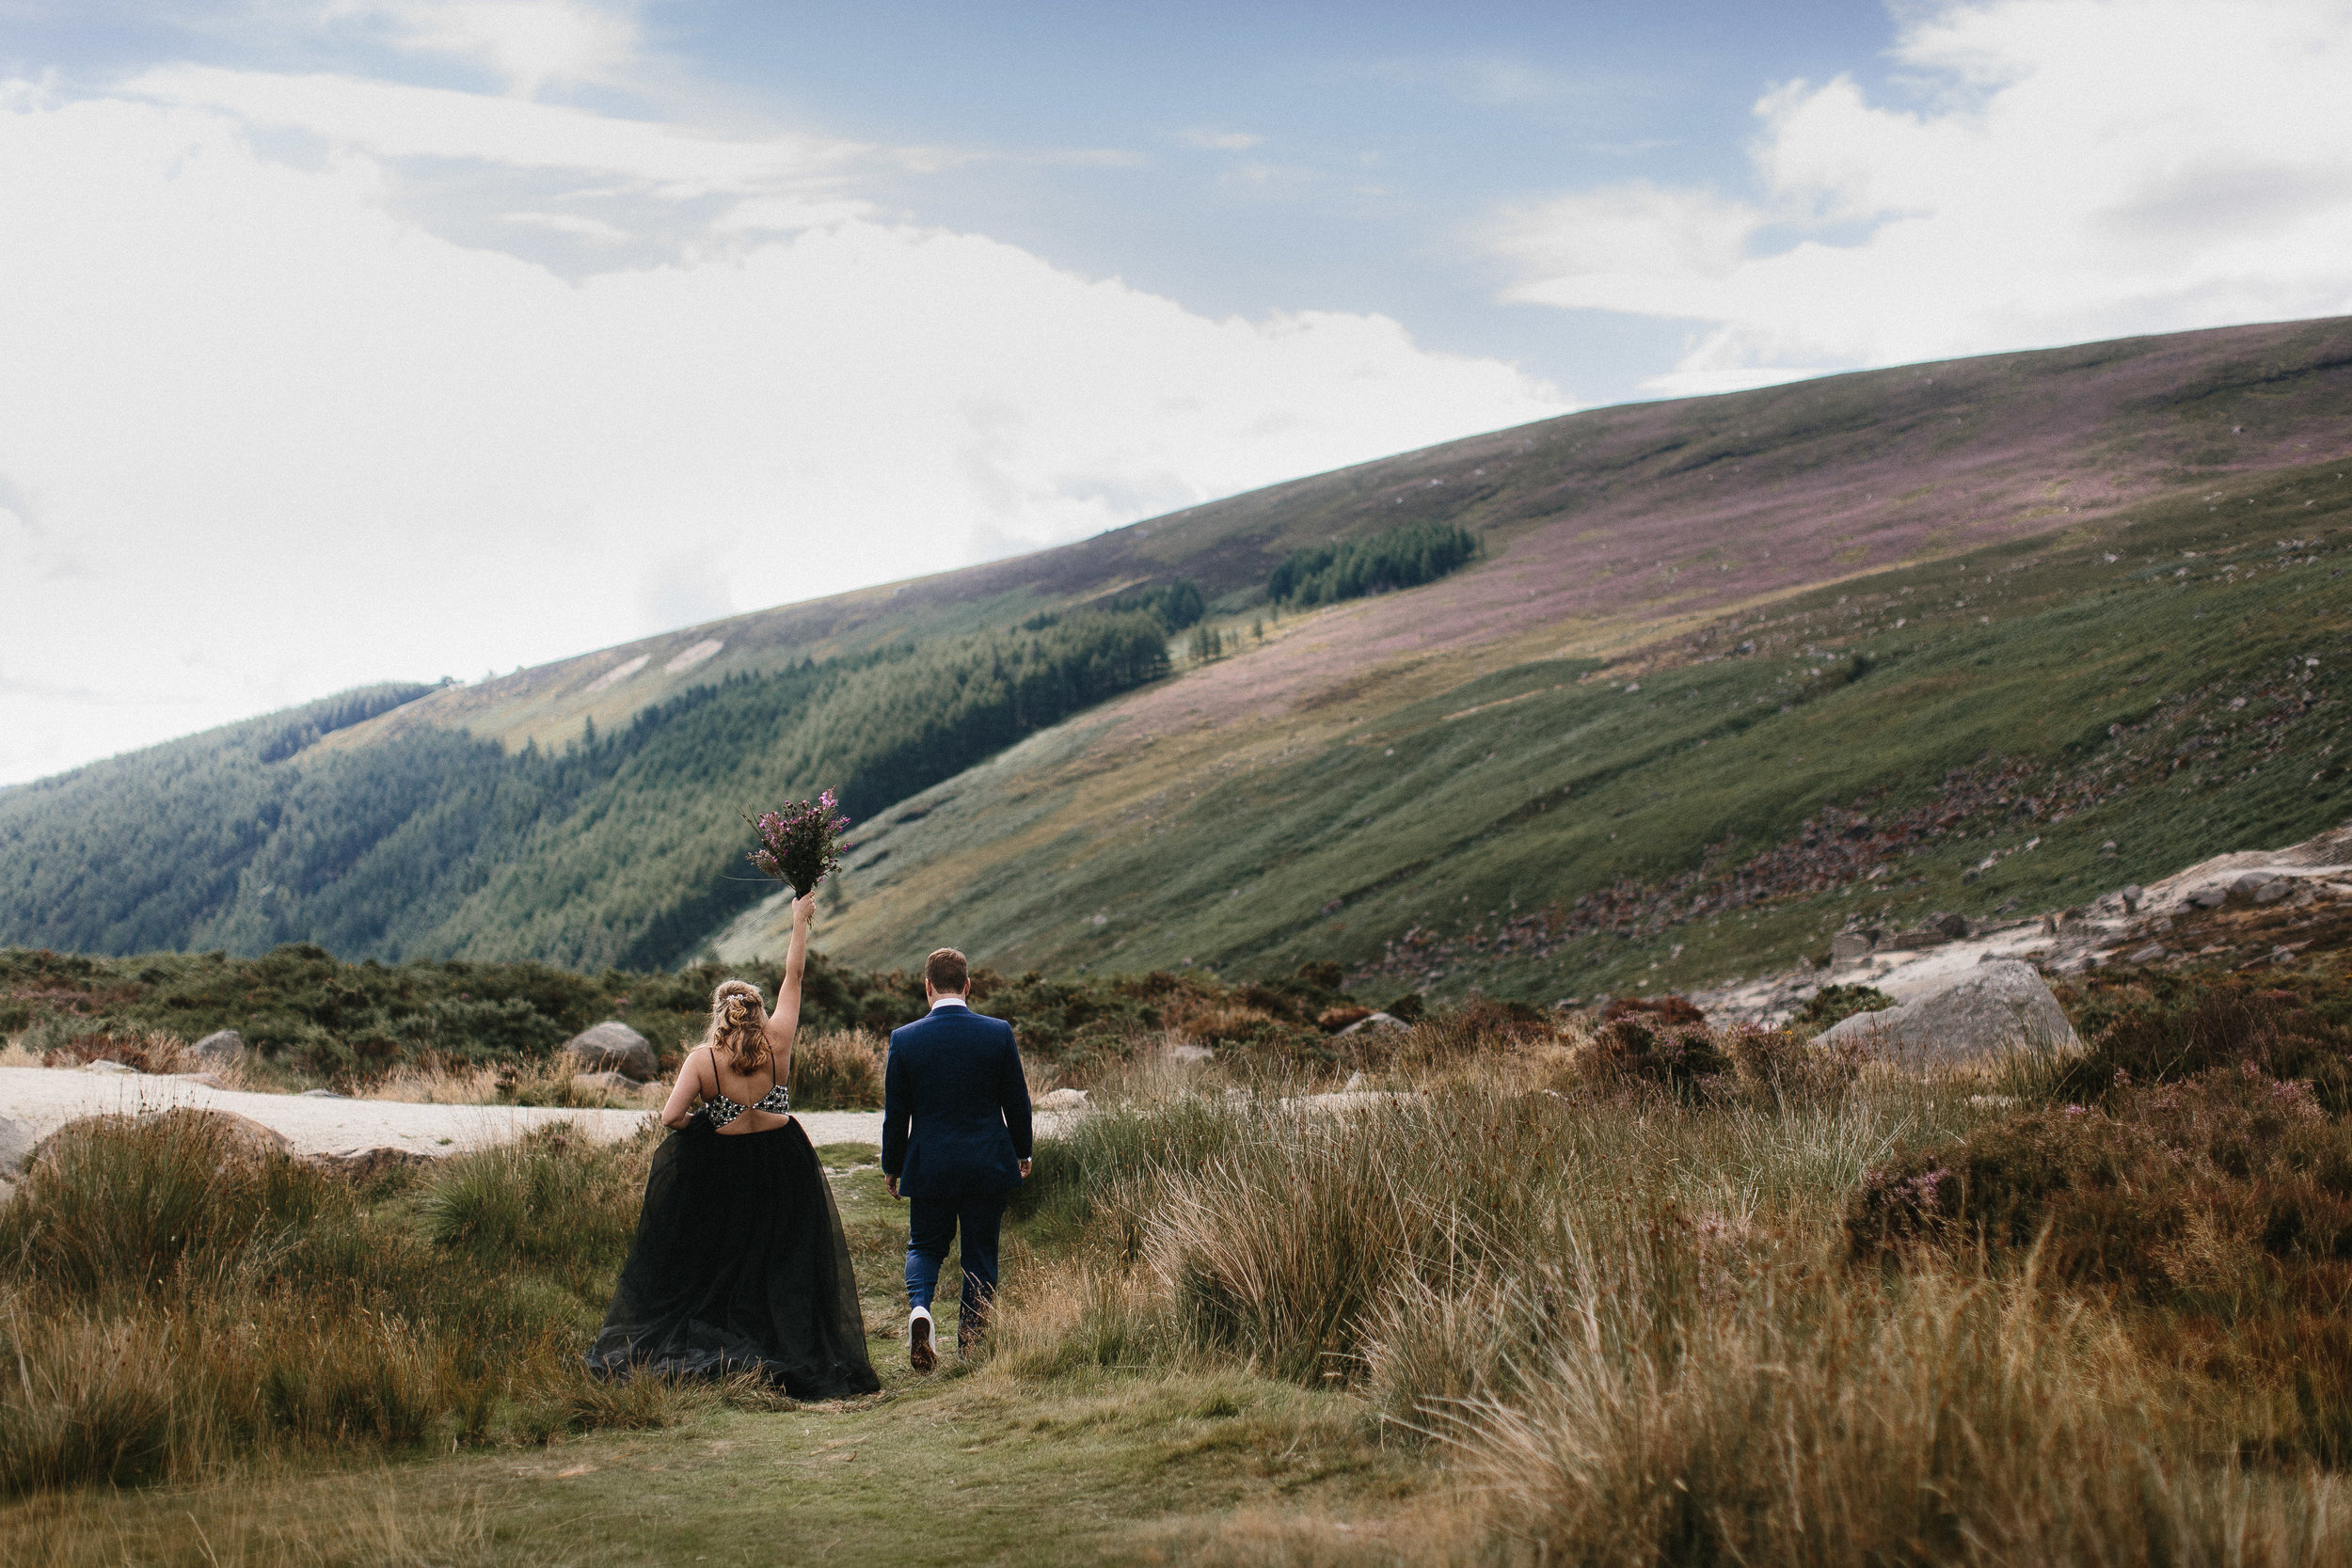 ireland_elopement_black_wedding_dress_wicklow_glendalough_athy_st_kevins_way_1355.jpg